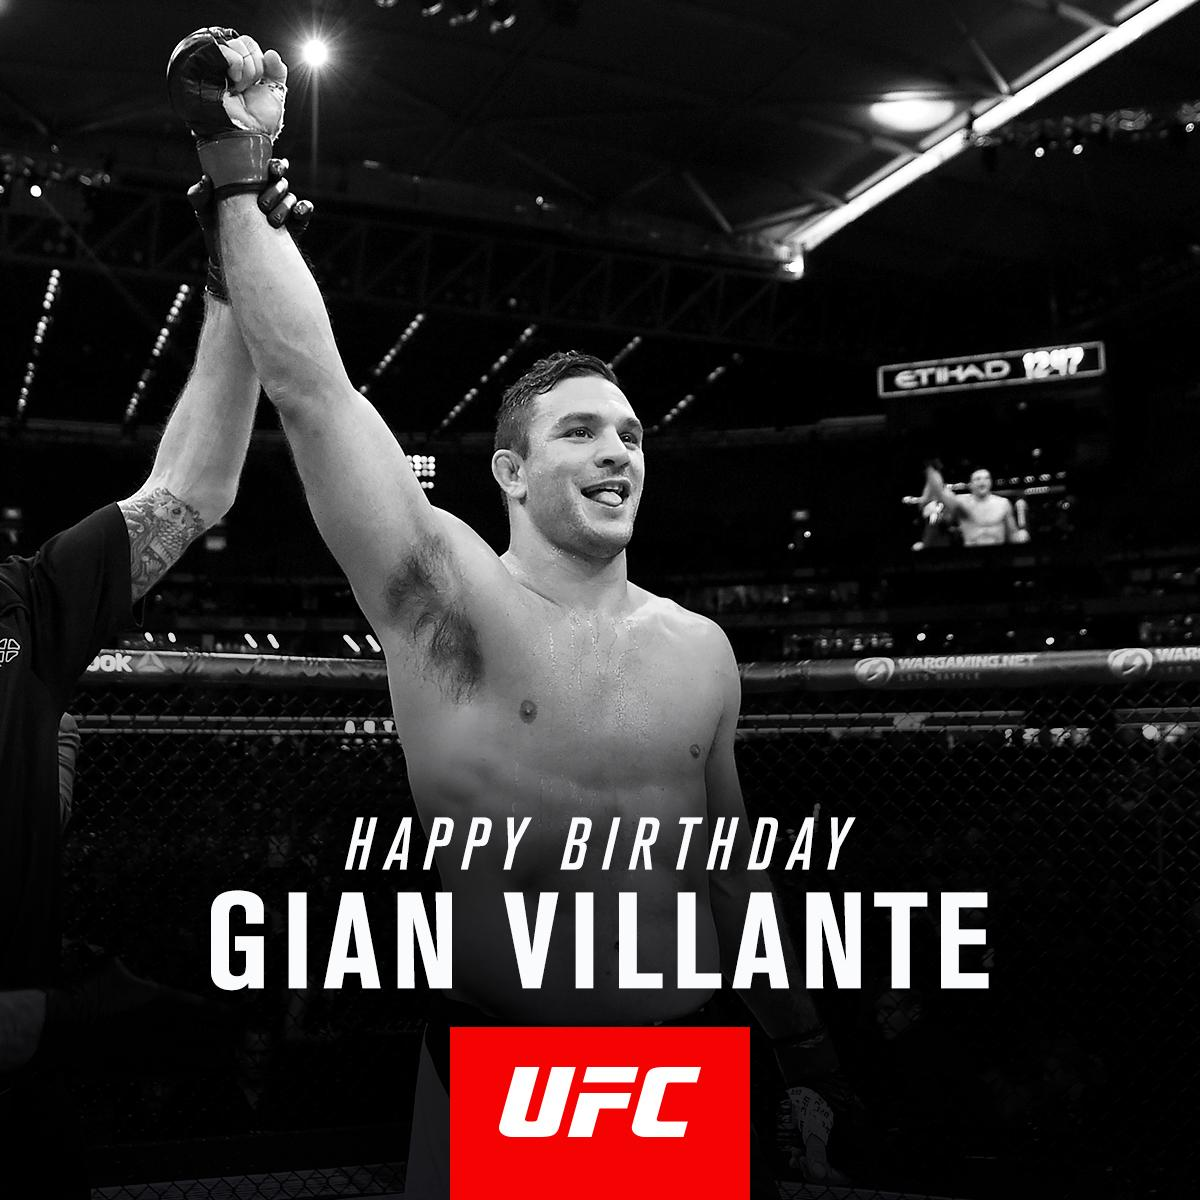 A BIG happy birthday shoutout to @GPVillante!